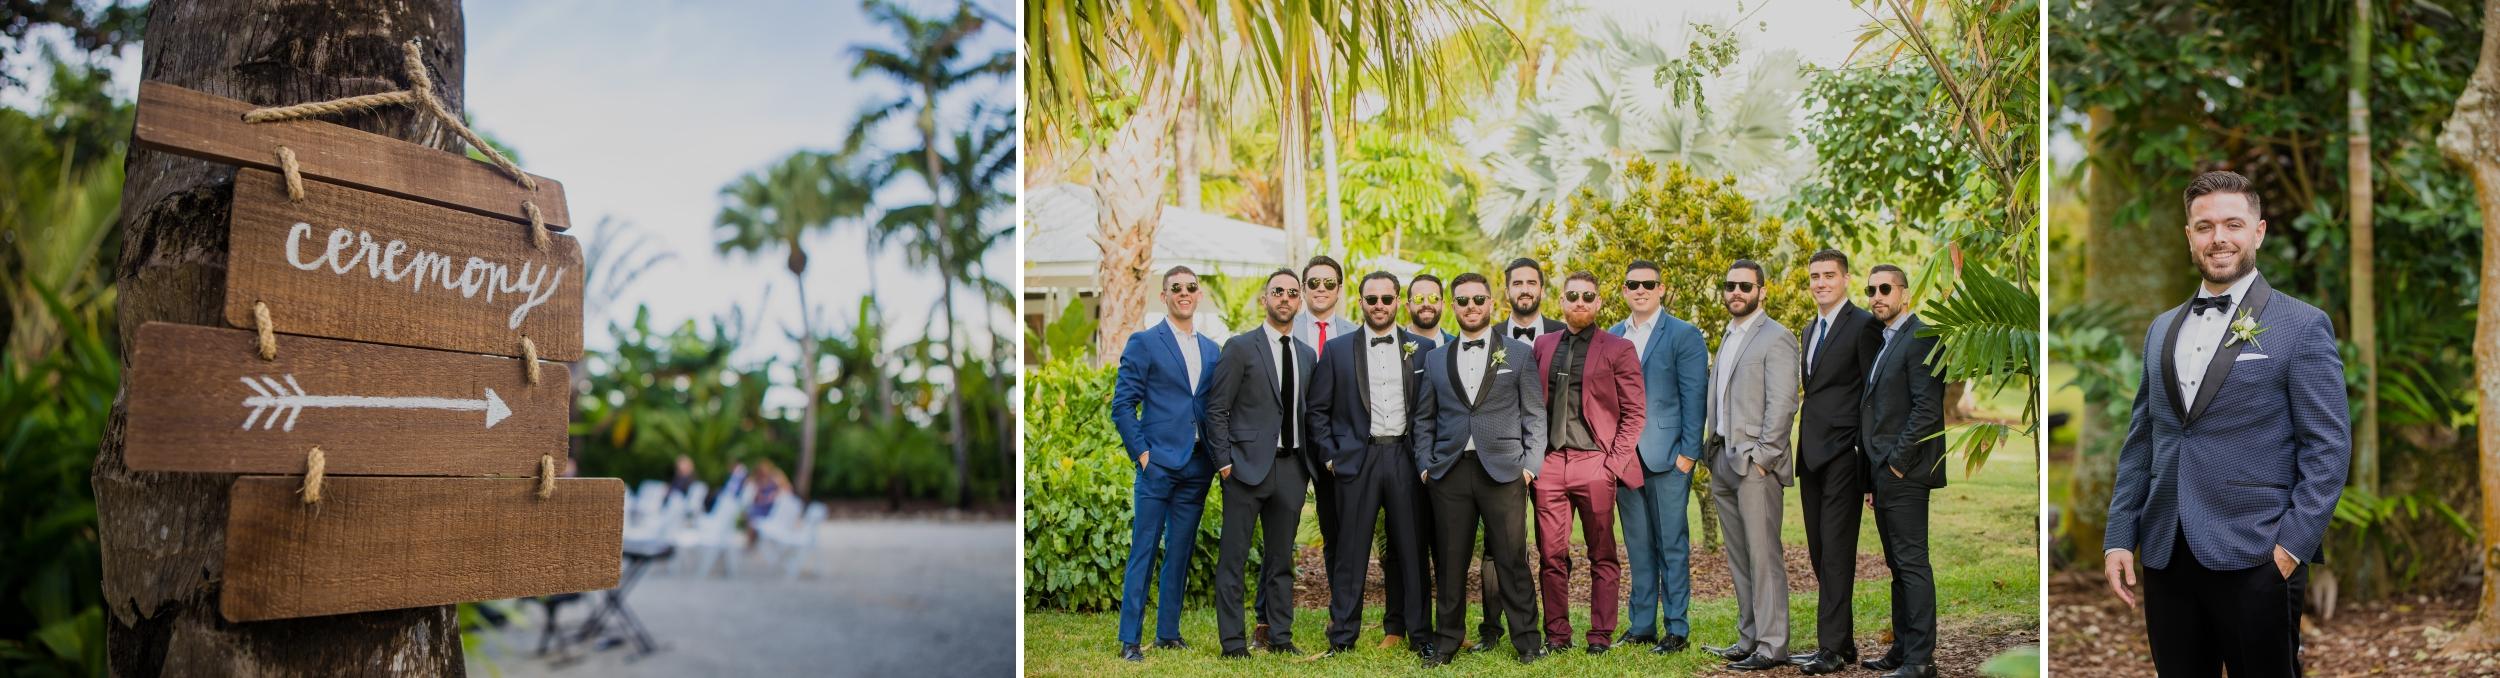 Wedding Whimsical Key West House  - Photography by Santy Martinez 11.jpg